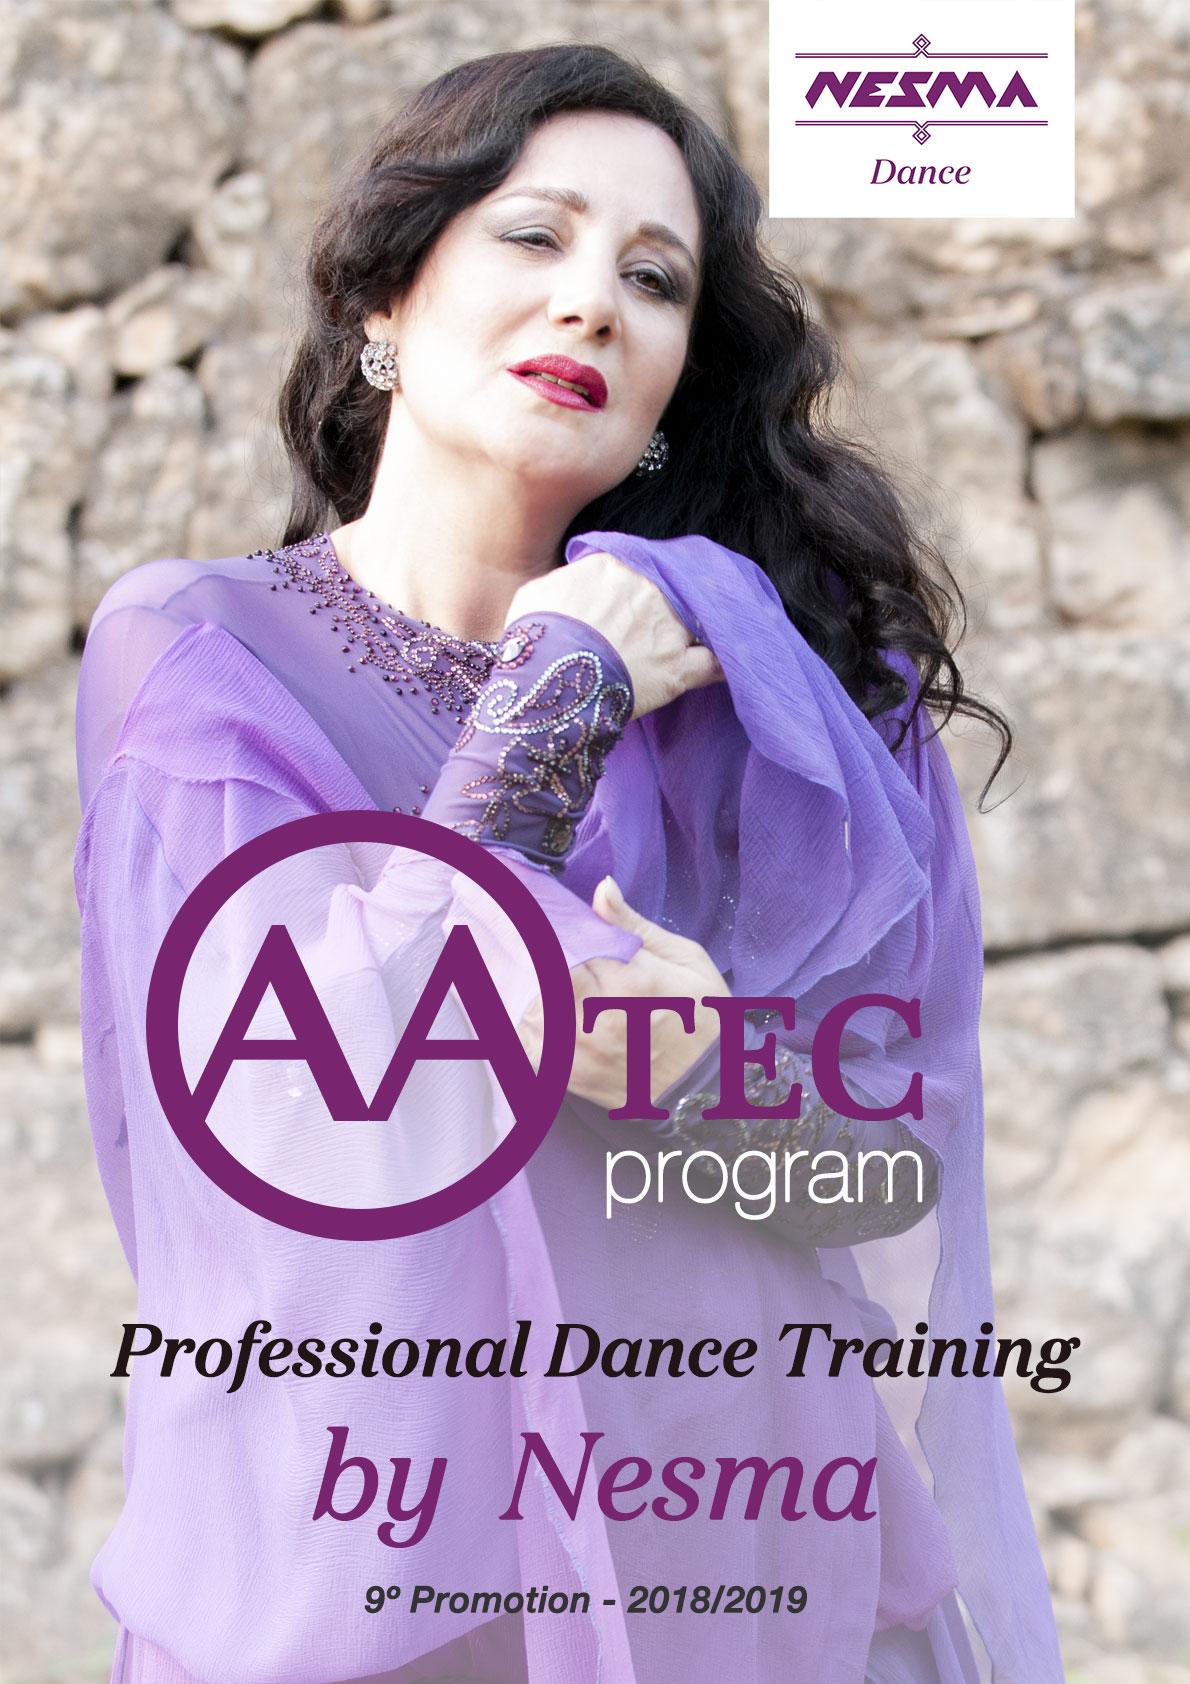 Nesma professional training oriental dance egyptian folklore neoandalusi bellydance